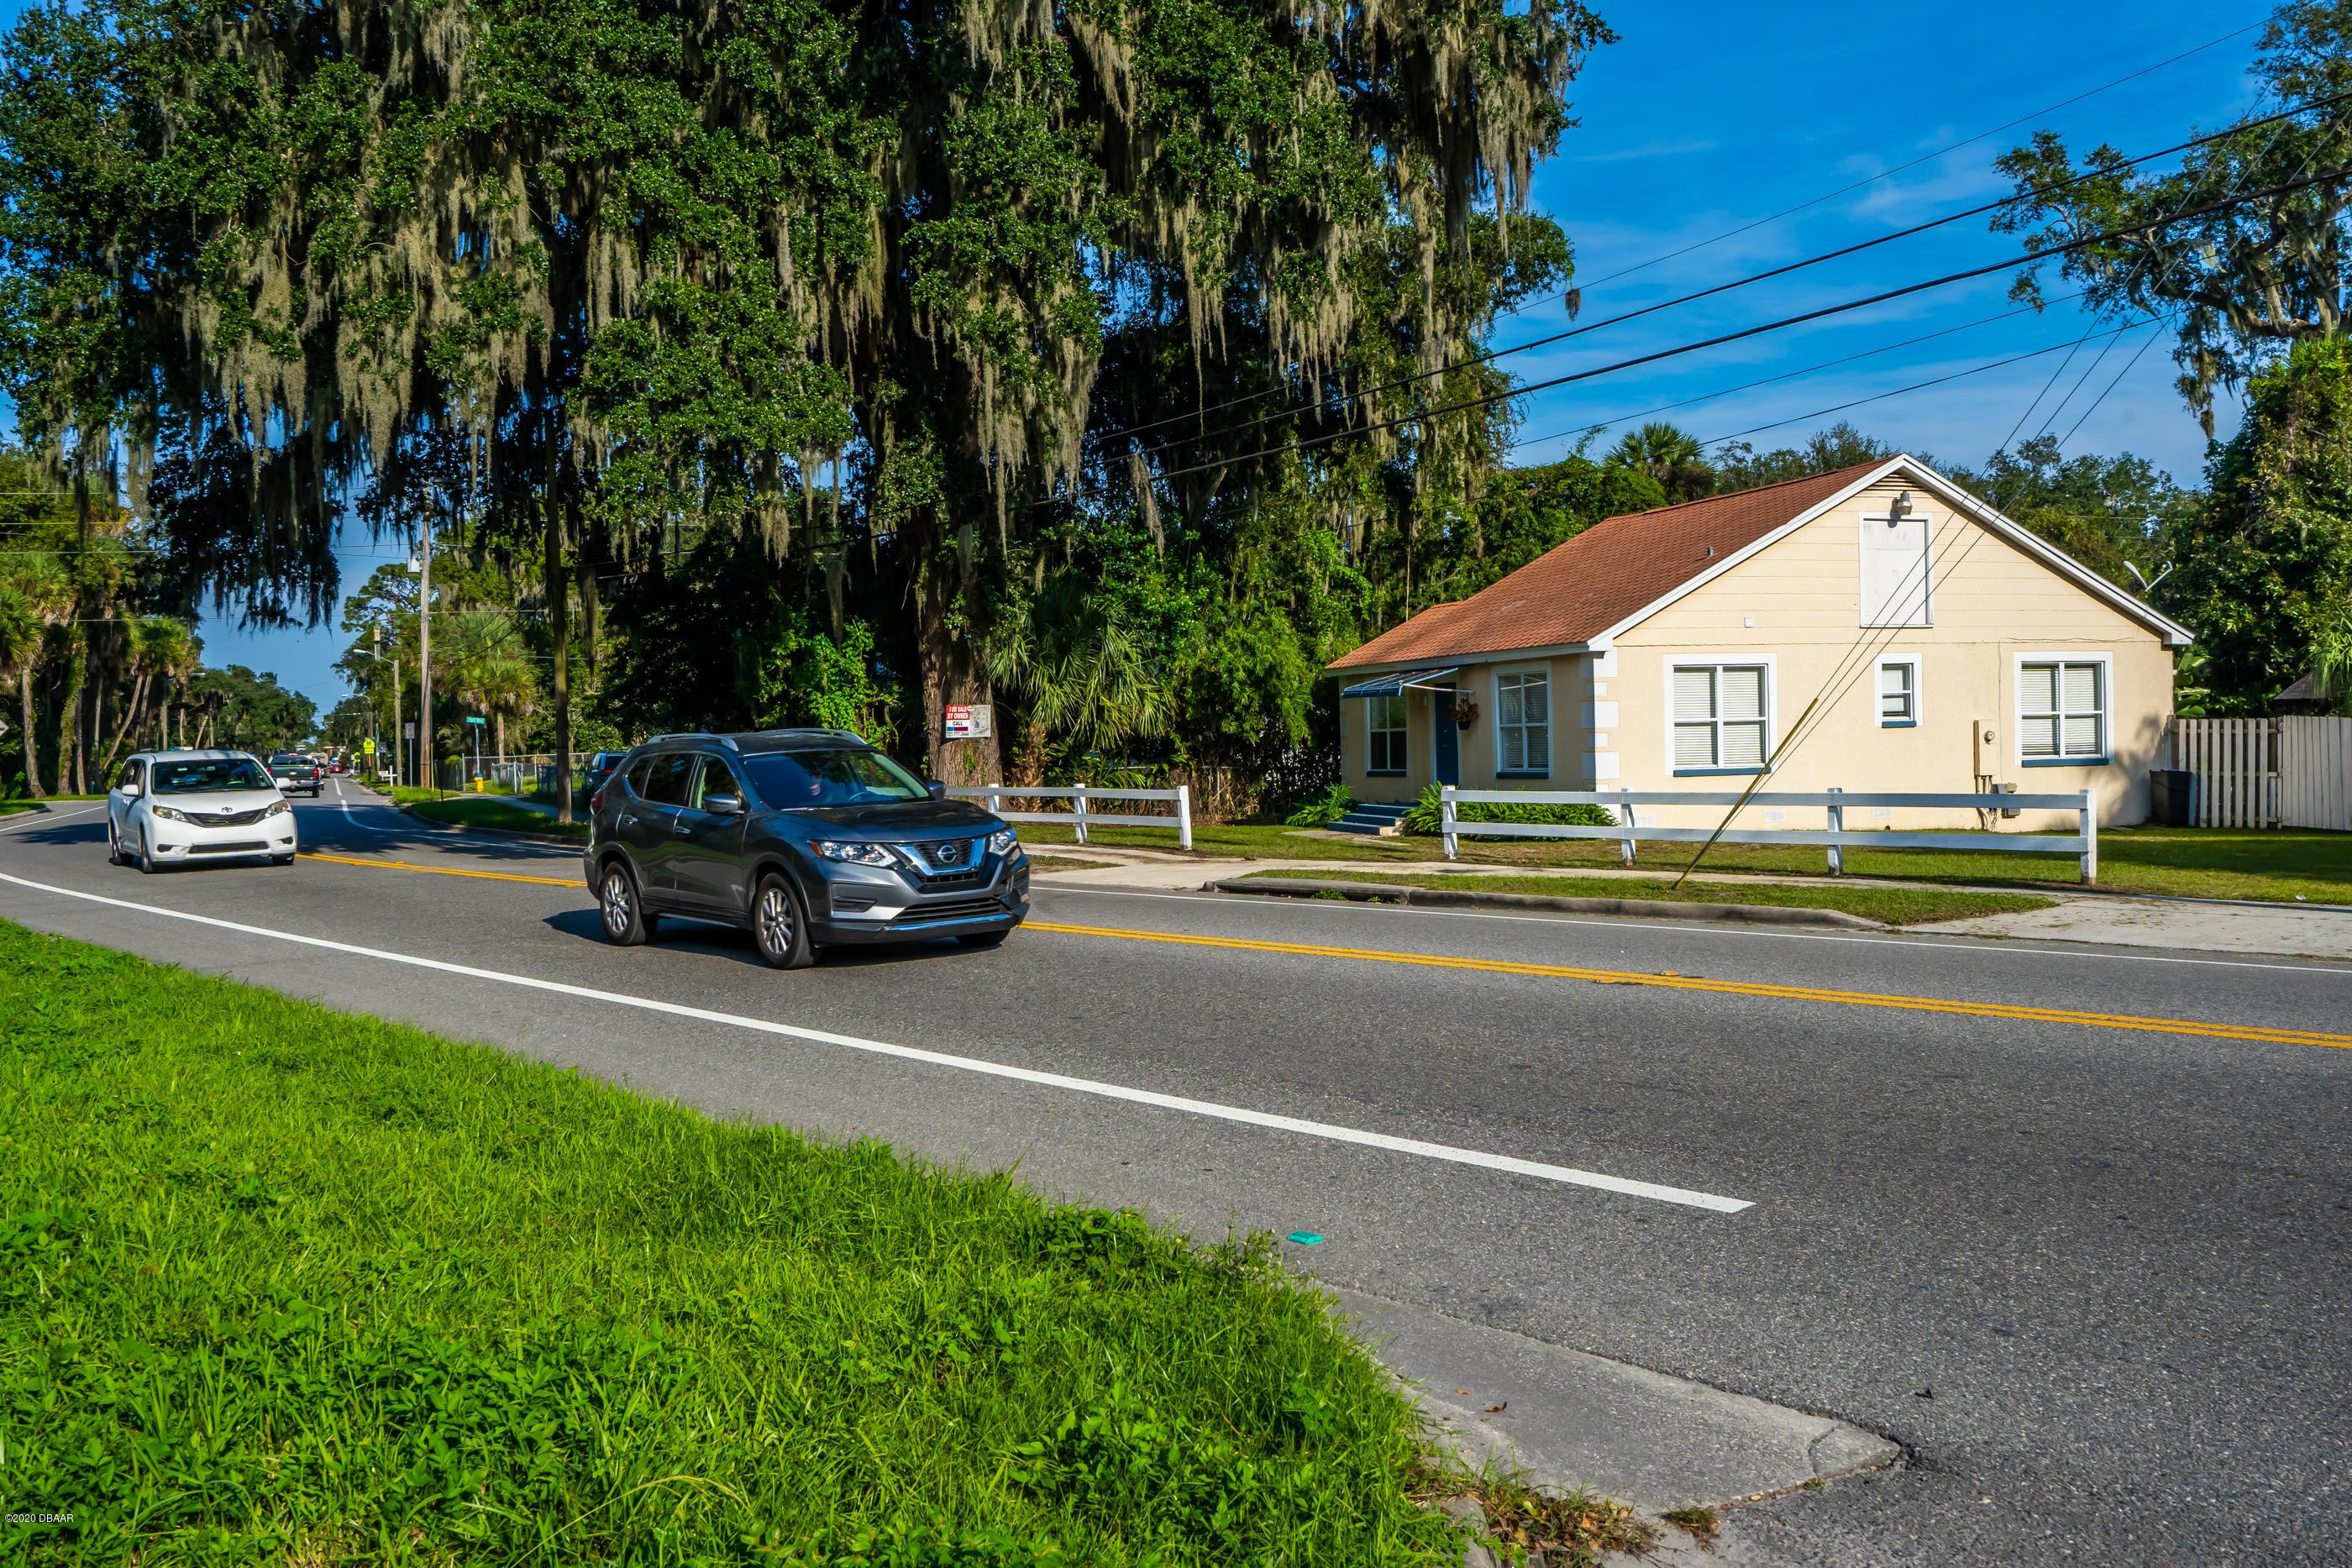 Photo of 906 Canal Street, New Smyrna Beach, FL 32168